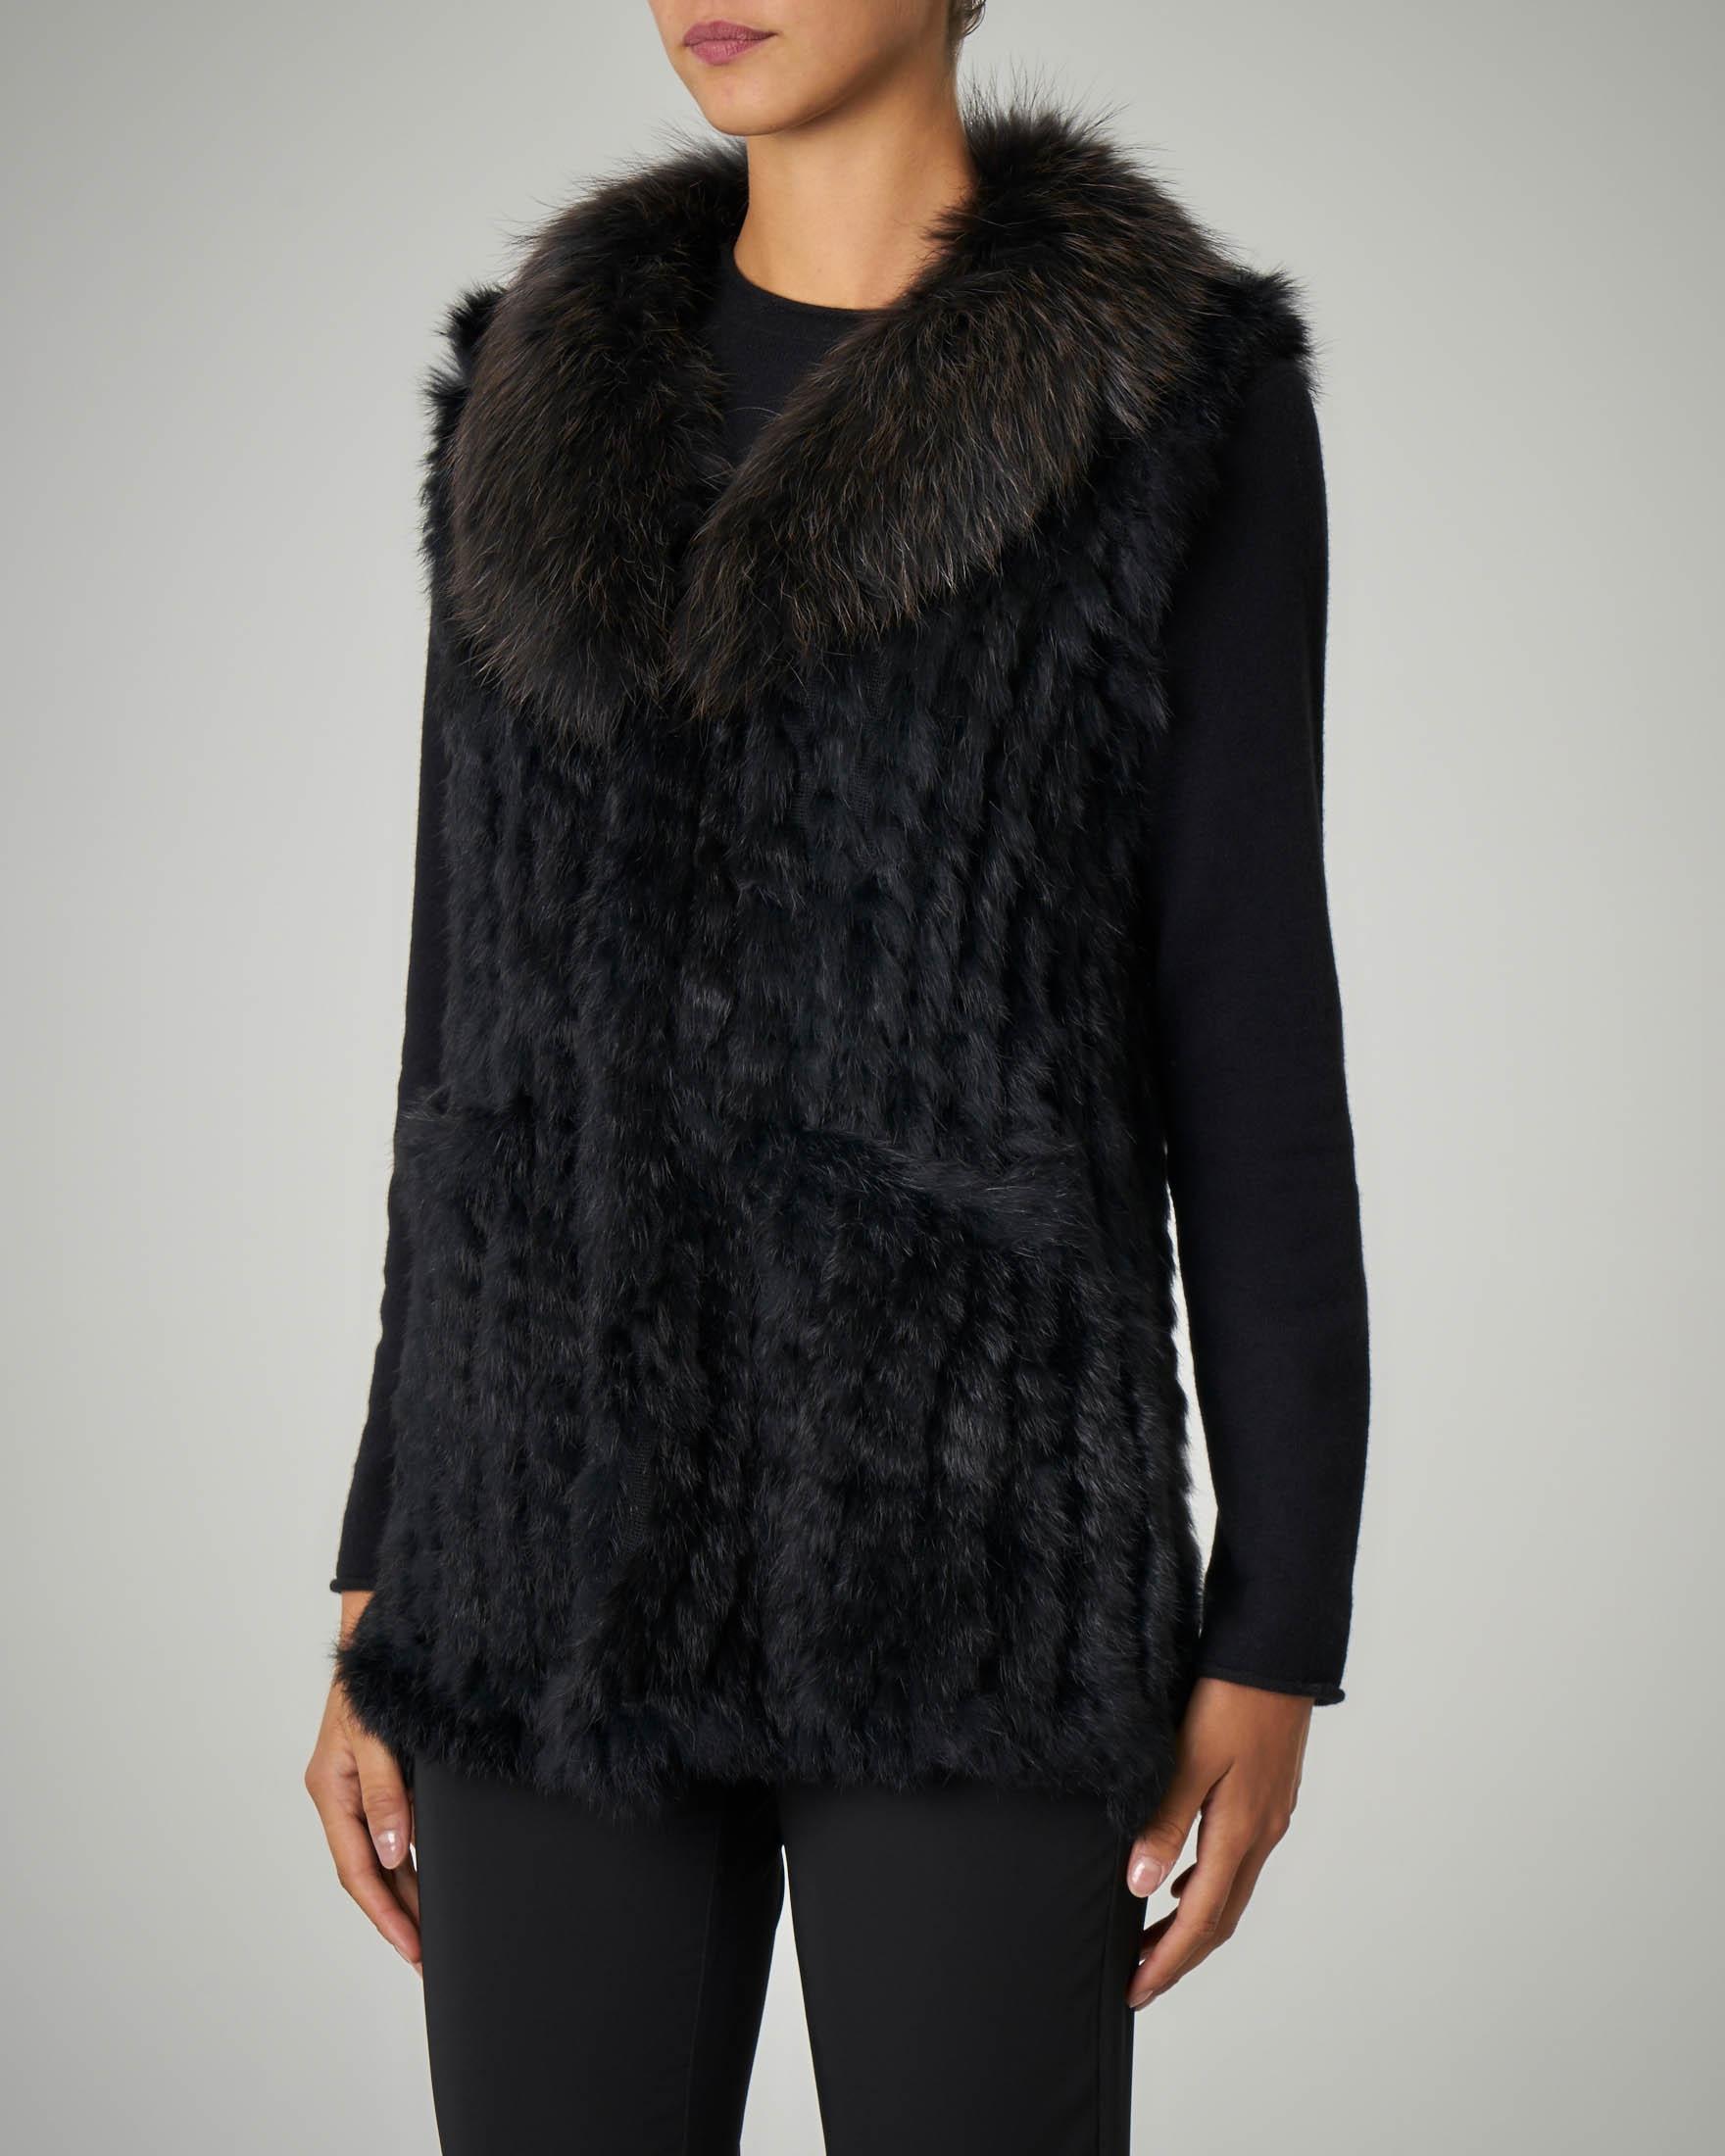 Gilet in pelliccia color nero